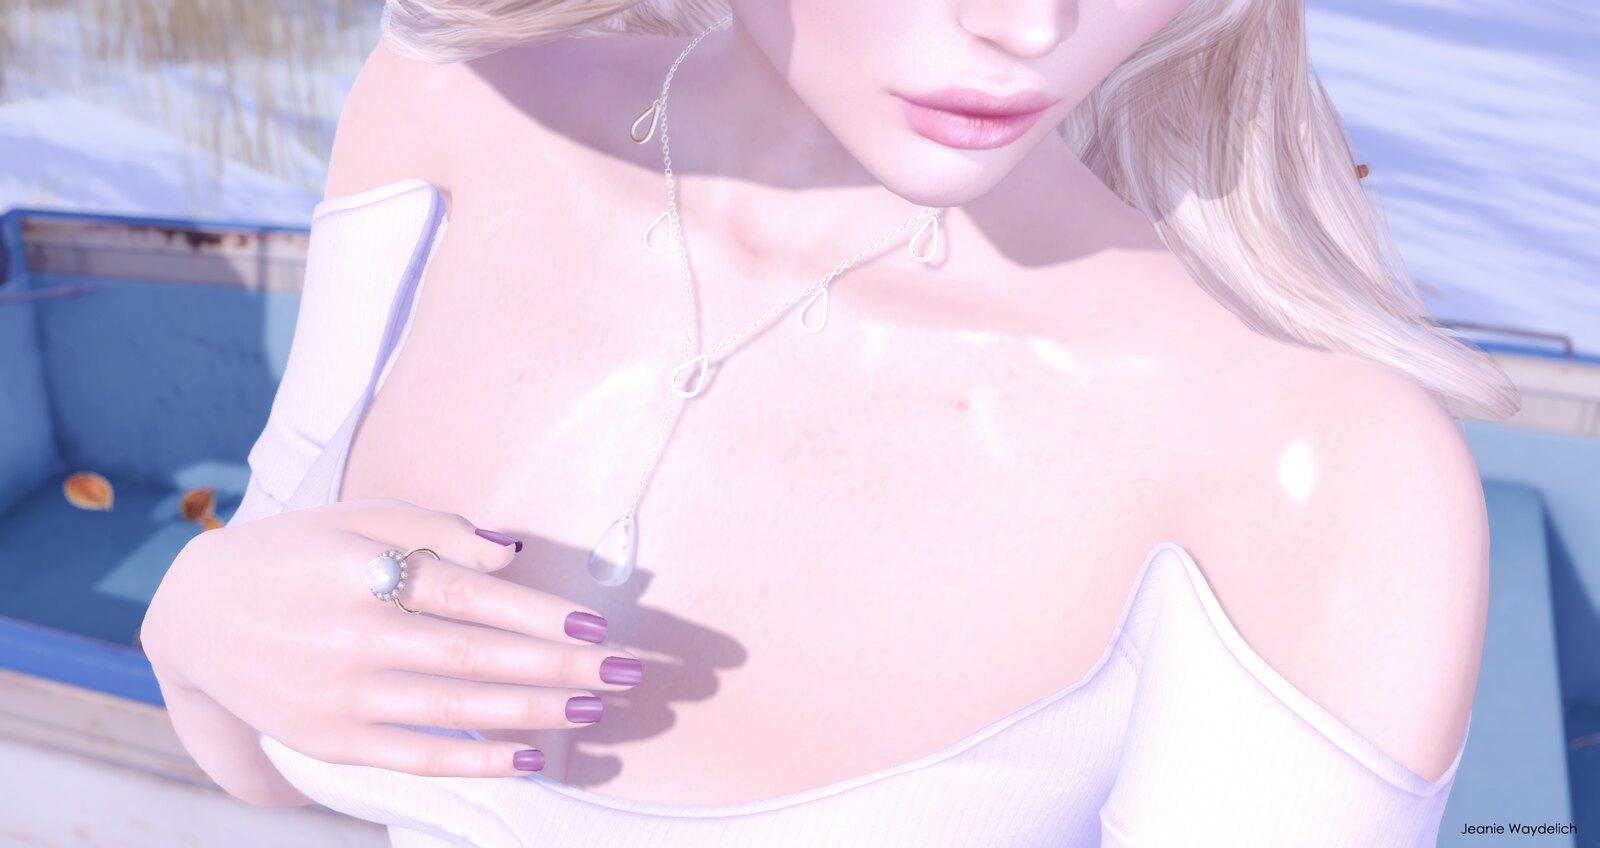 LOTD 880 - Lavender